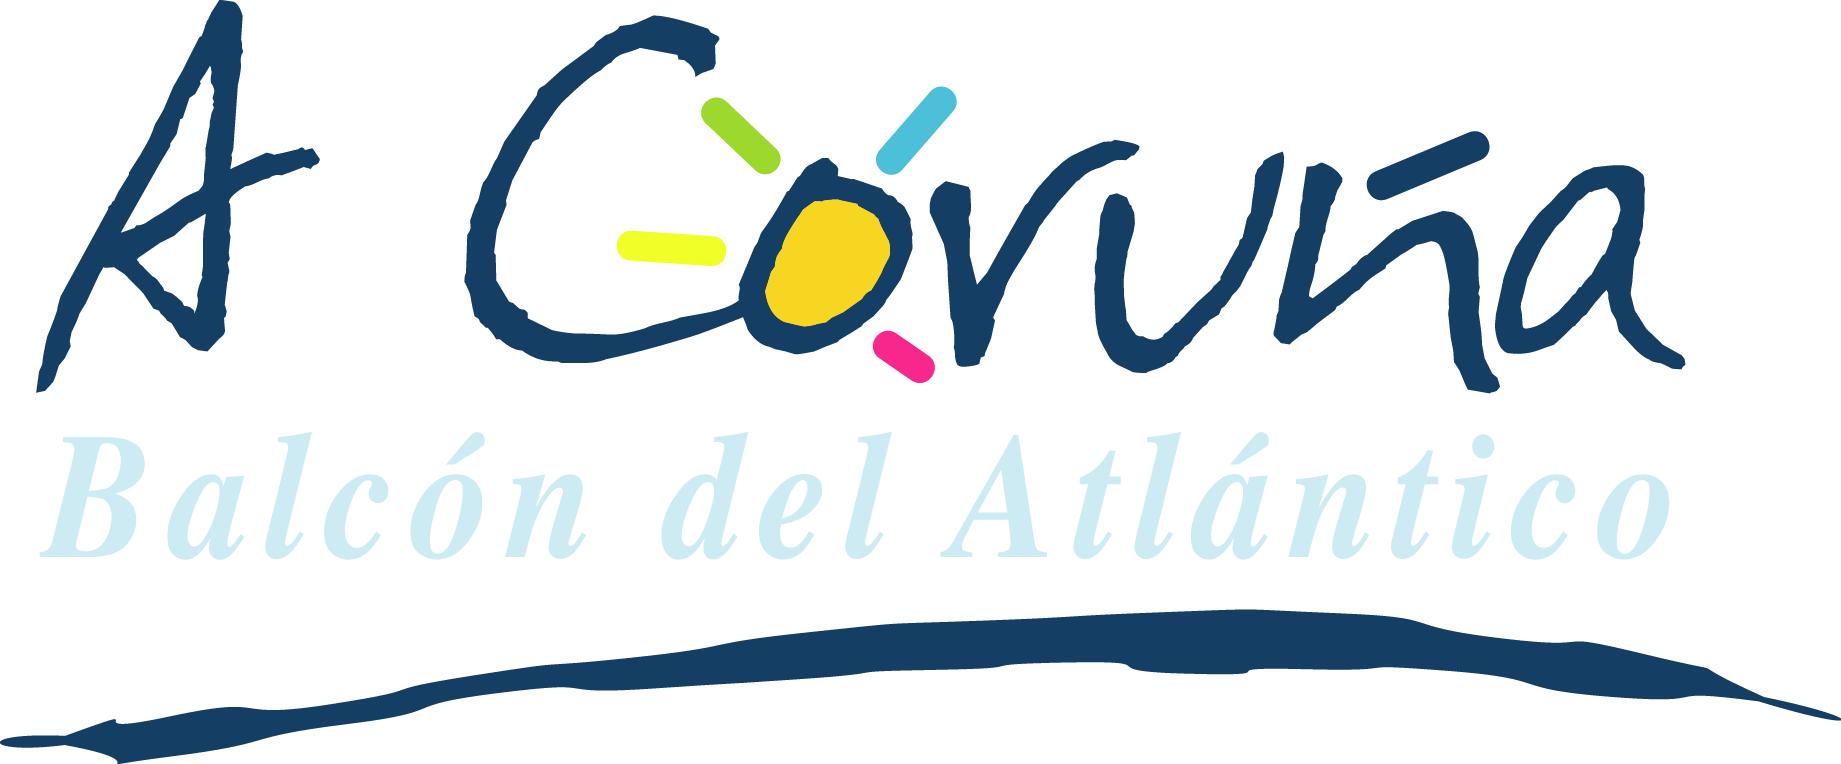 free vector A coruna balcon del atlantico - A Coruna Vector PNG